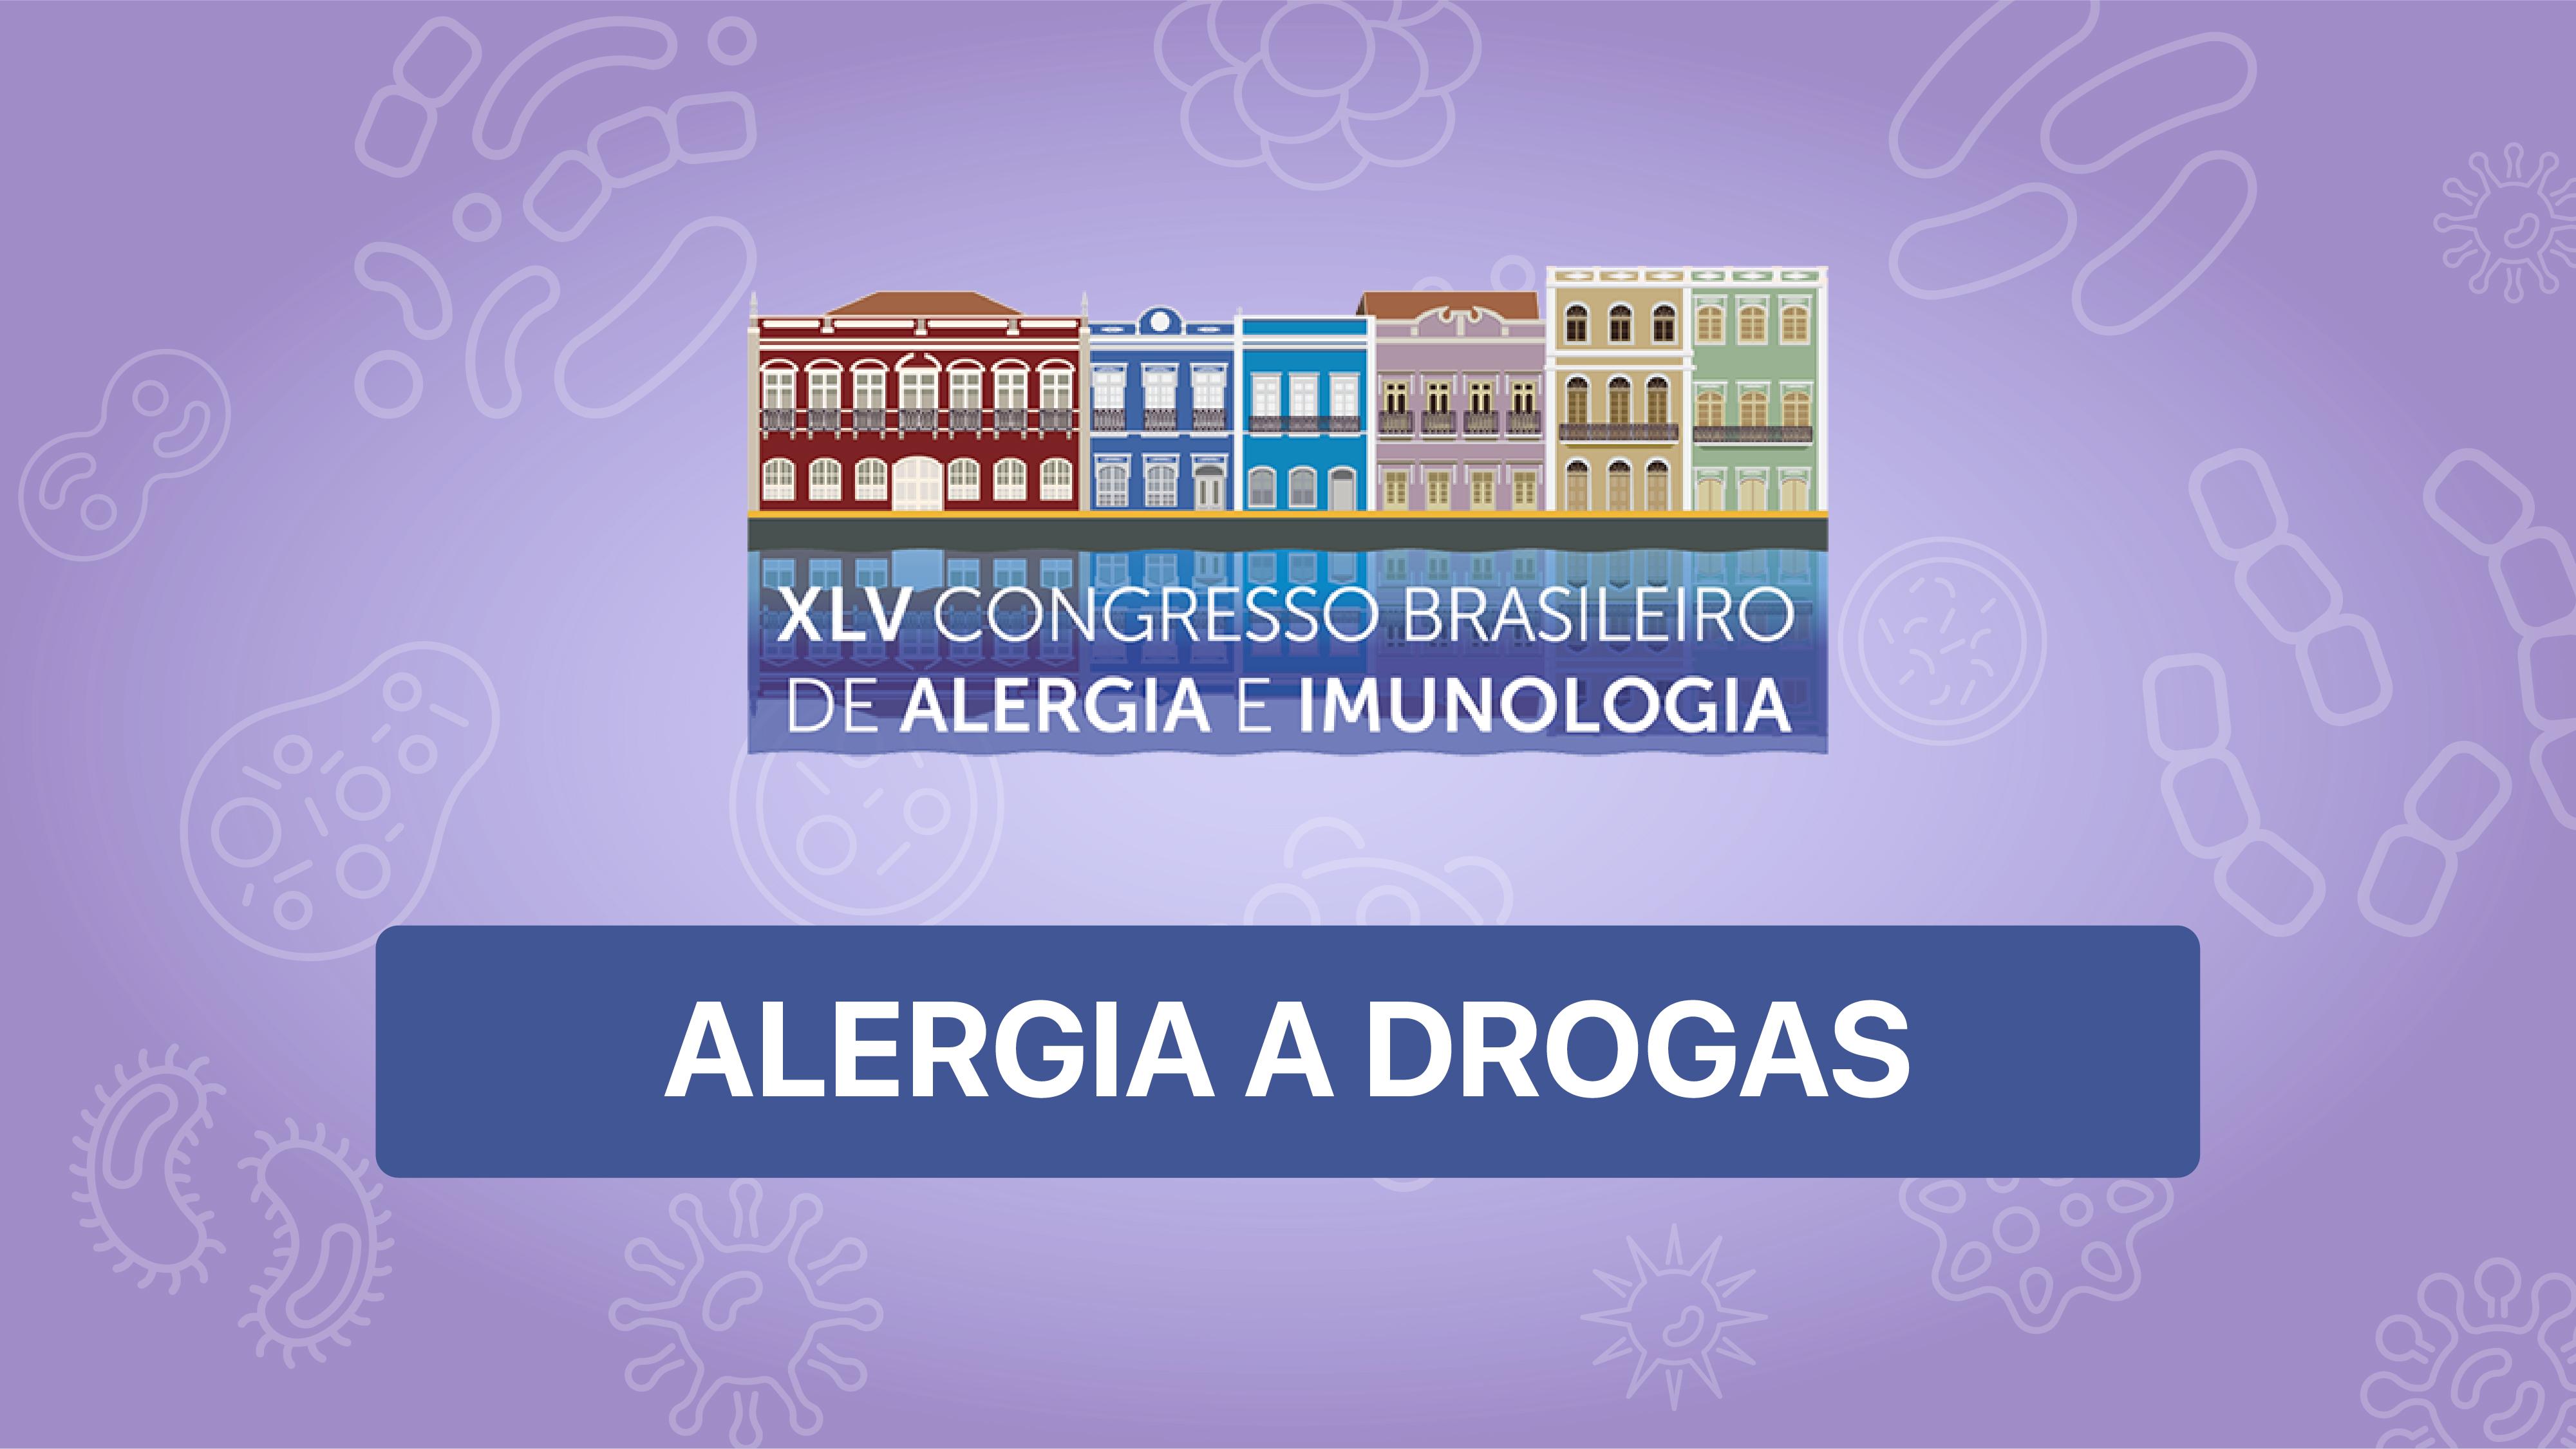 Alergia%20a%20drogas